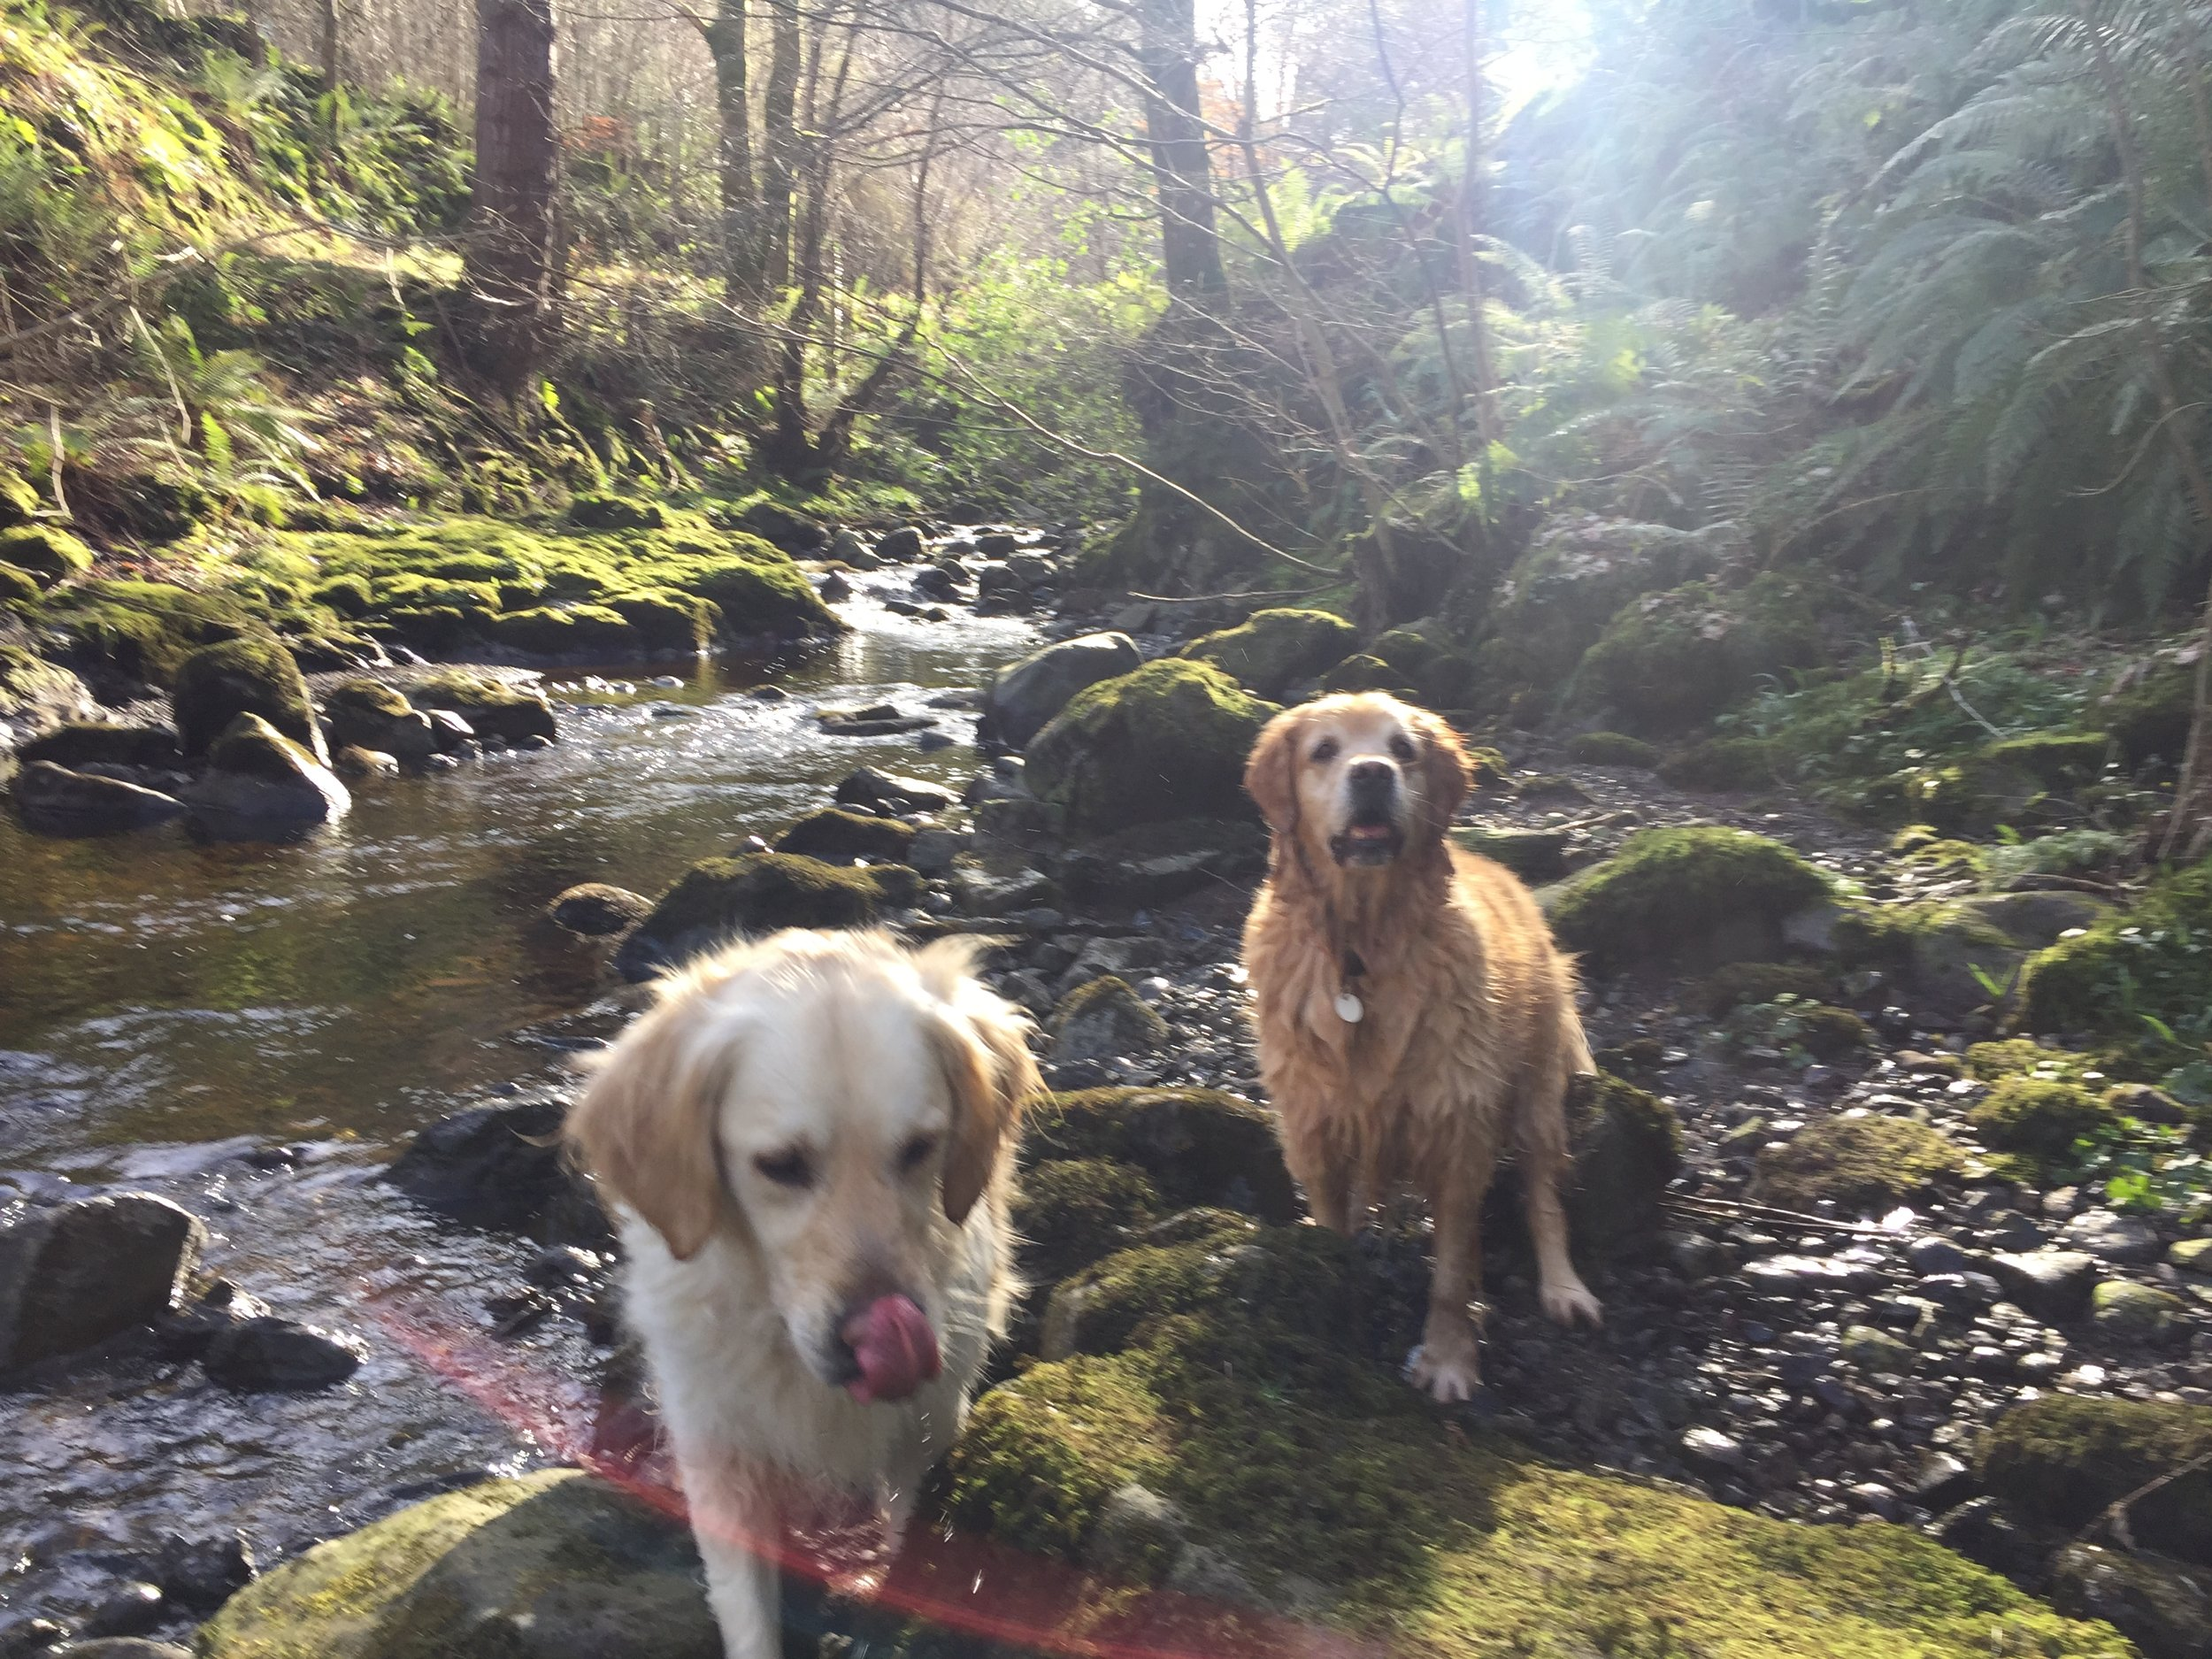 river_forest_golden_retrievers_glenariff_glenoe_glenarm_glens_antrim_ni_explorer_niexplorer_northern_ireland_blog.jpg